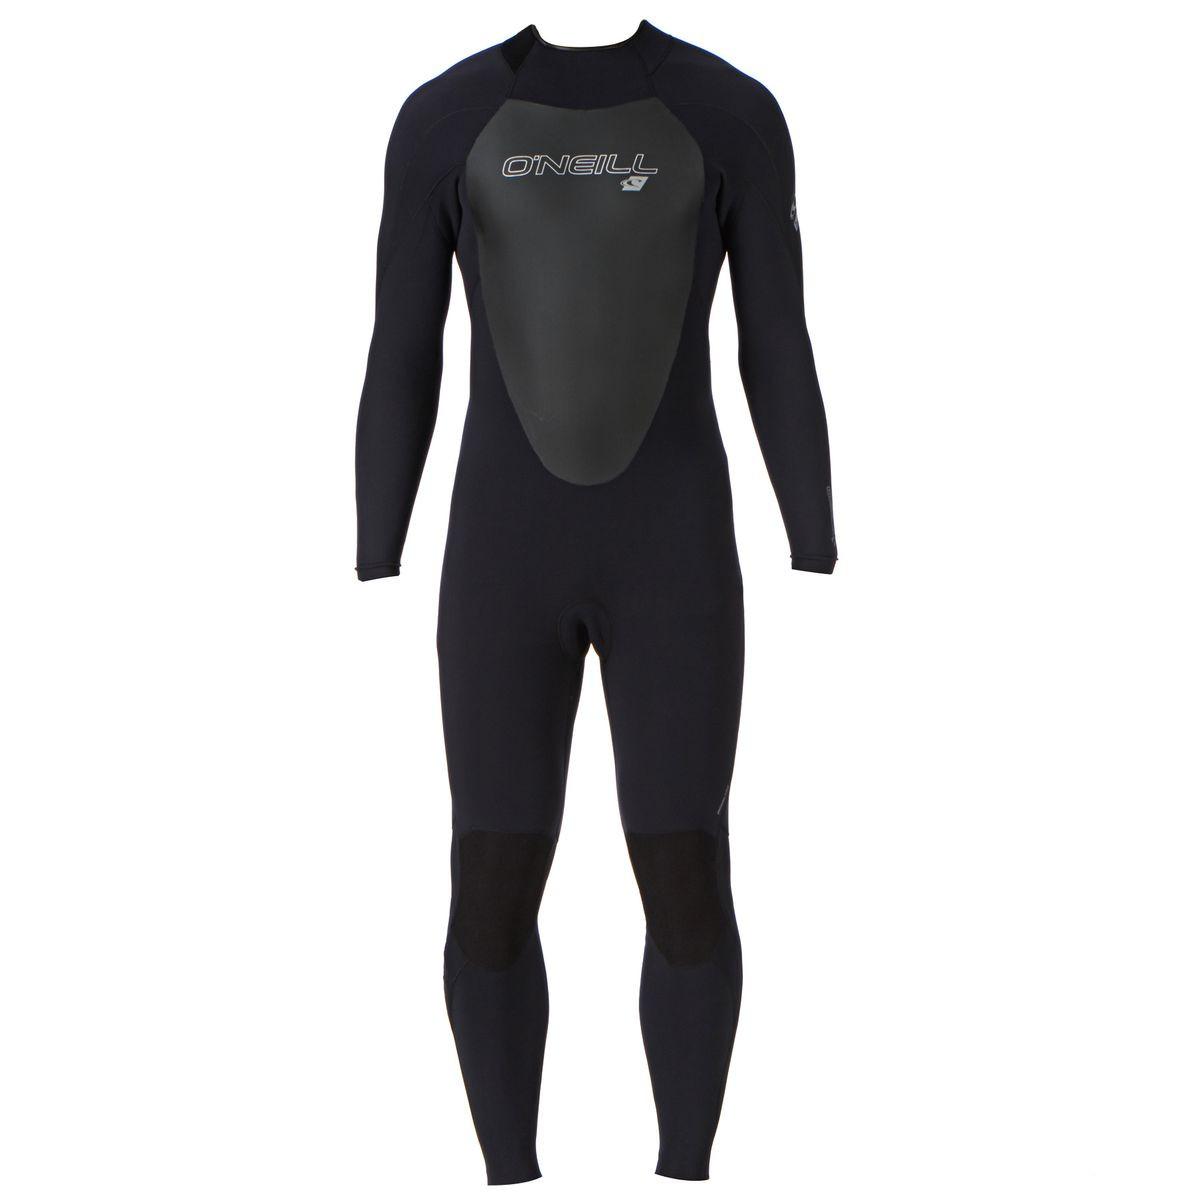 O'Neill Epic 4/3mm Back Zip Wetsuit - Black/Black/Black